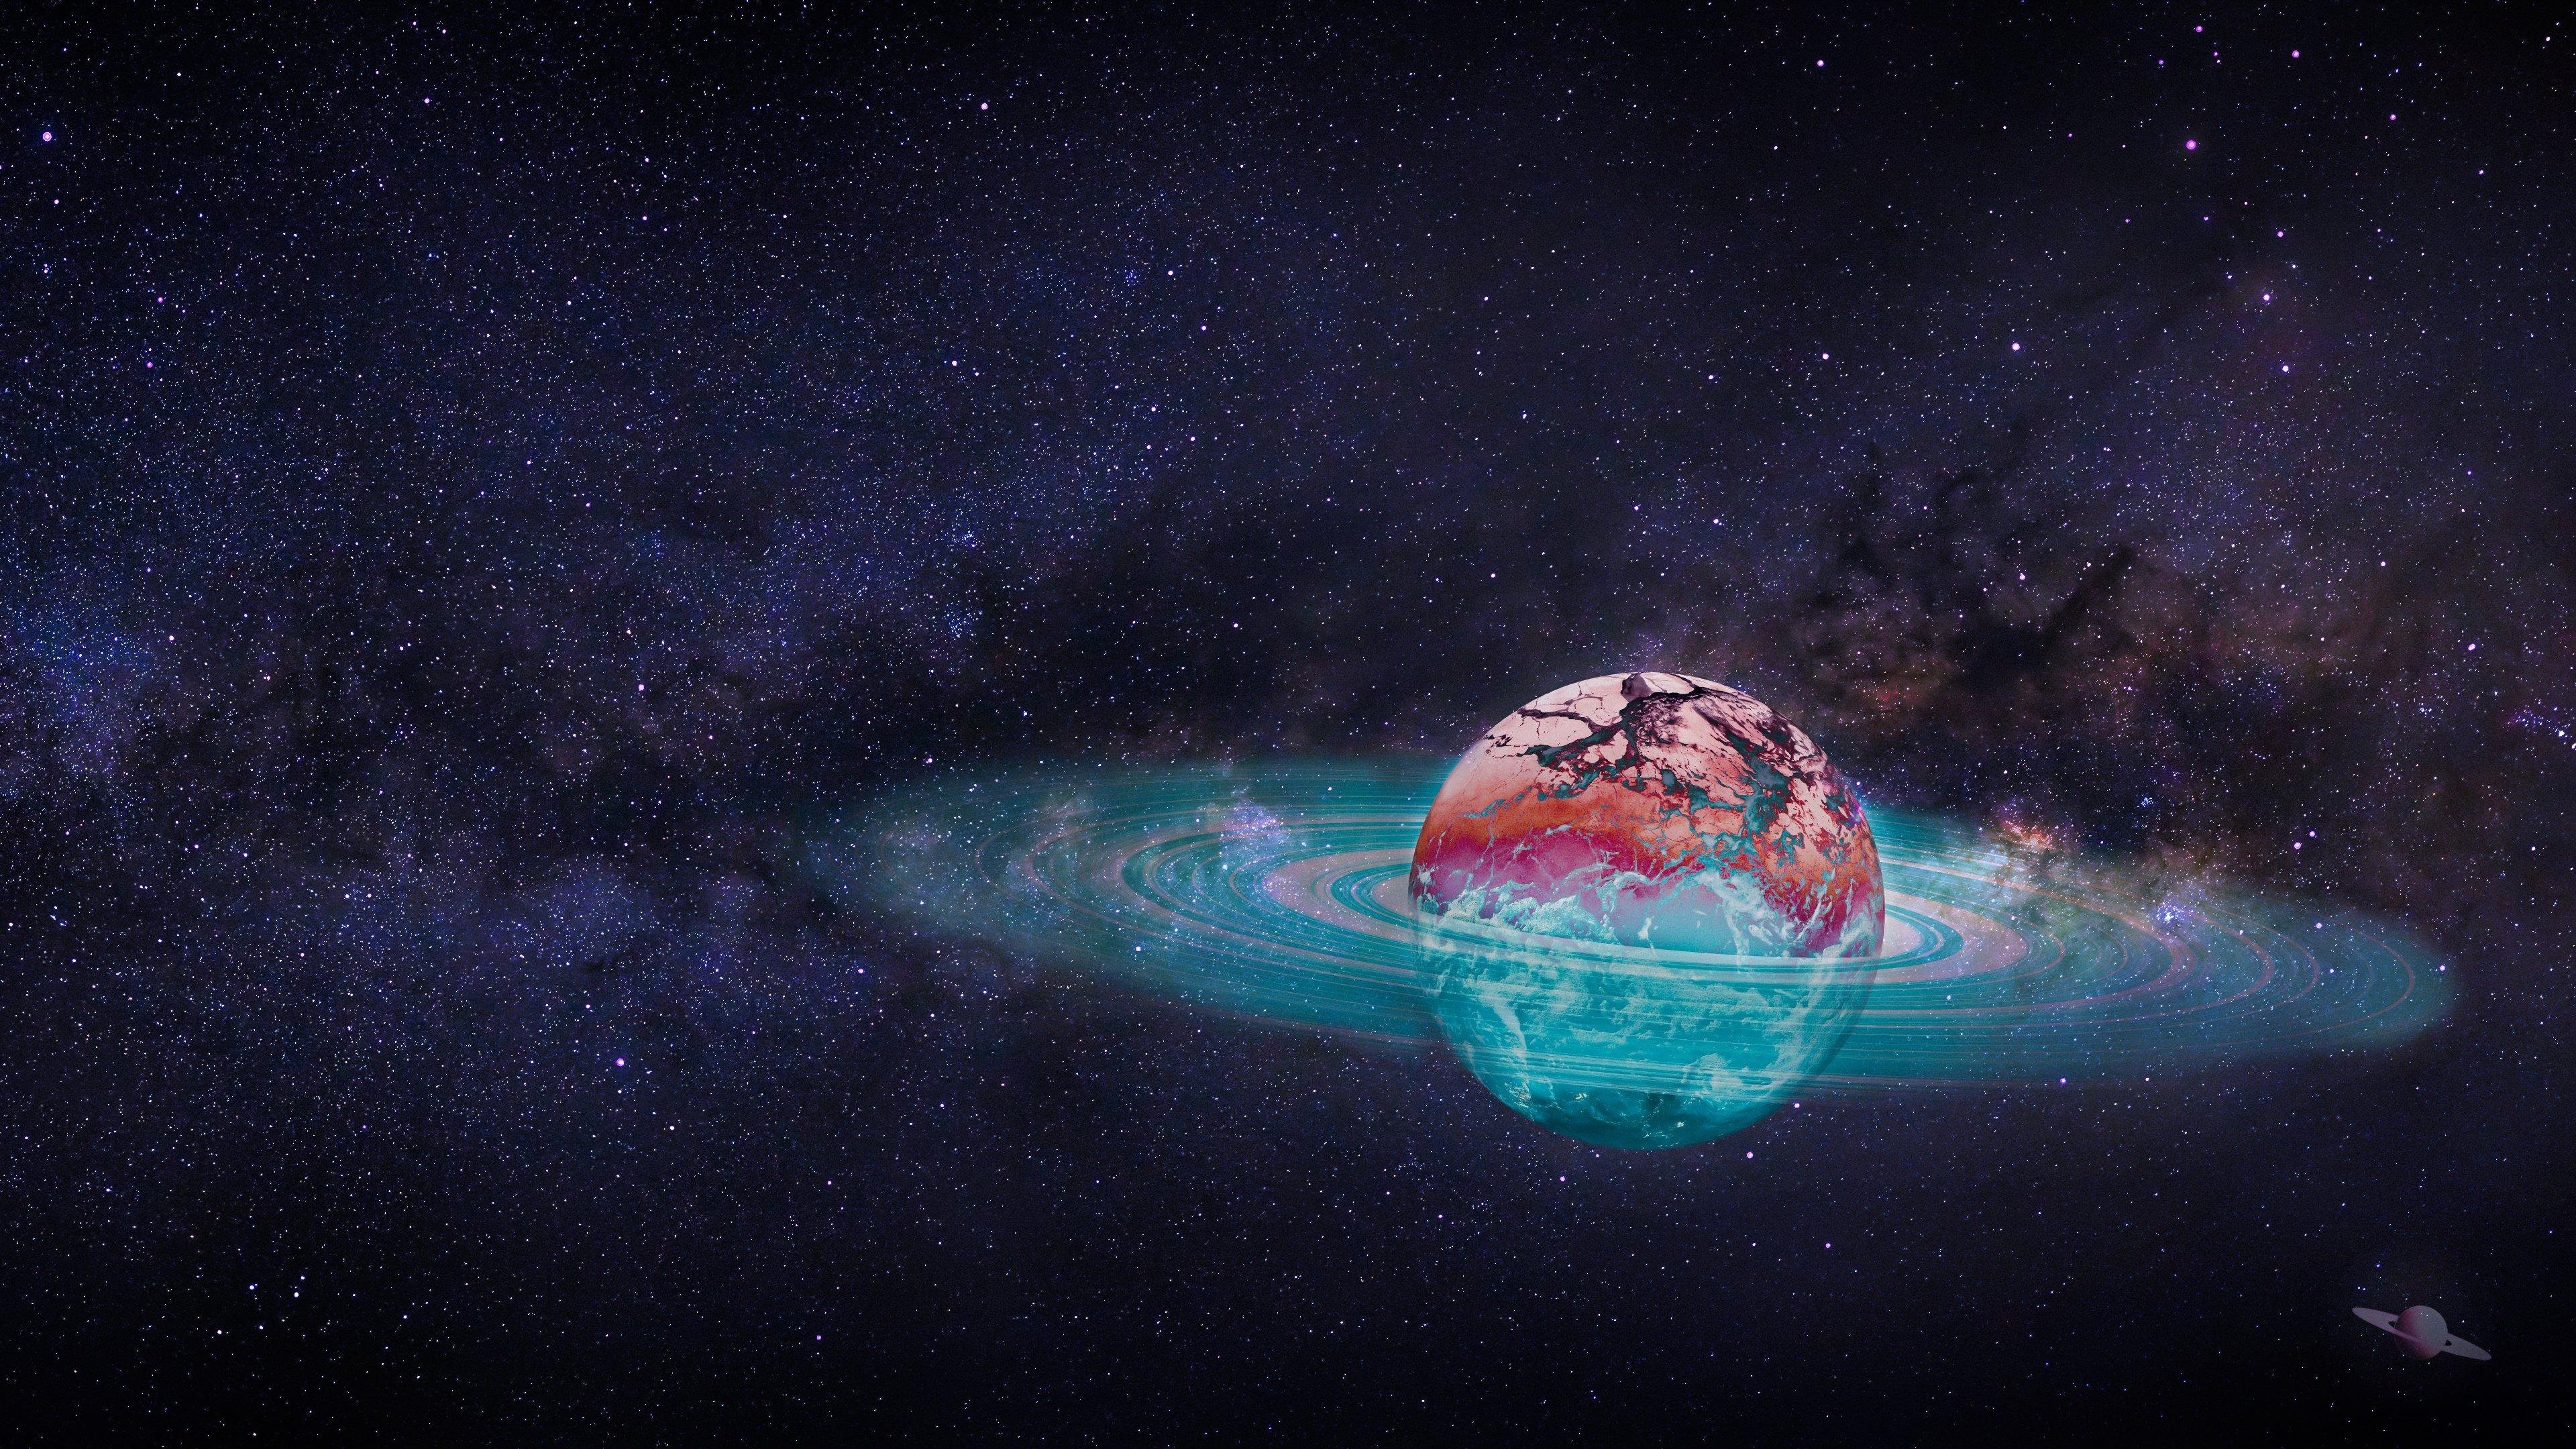 Fondos de pantalla Saturno Arte digital